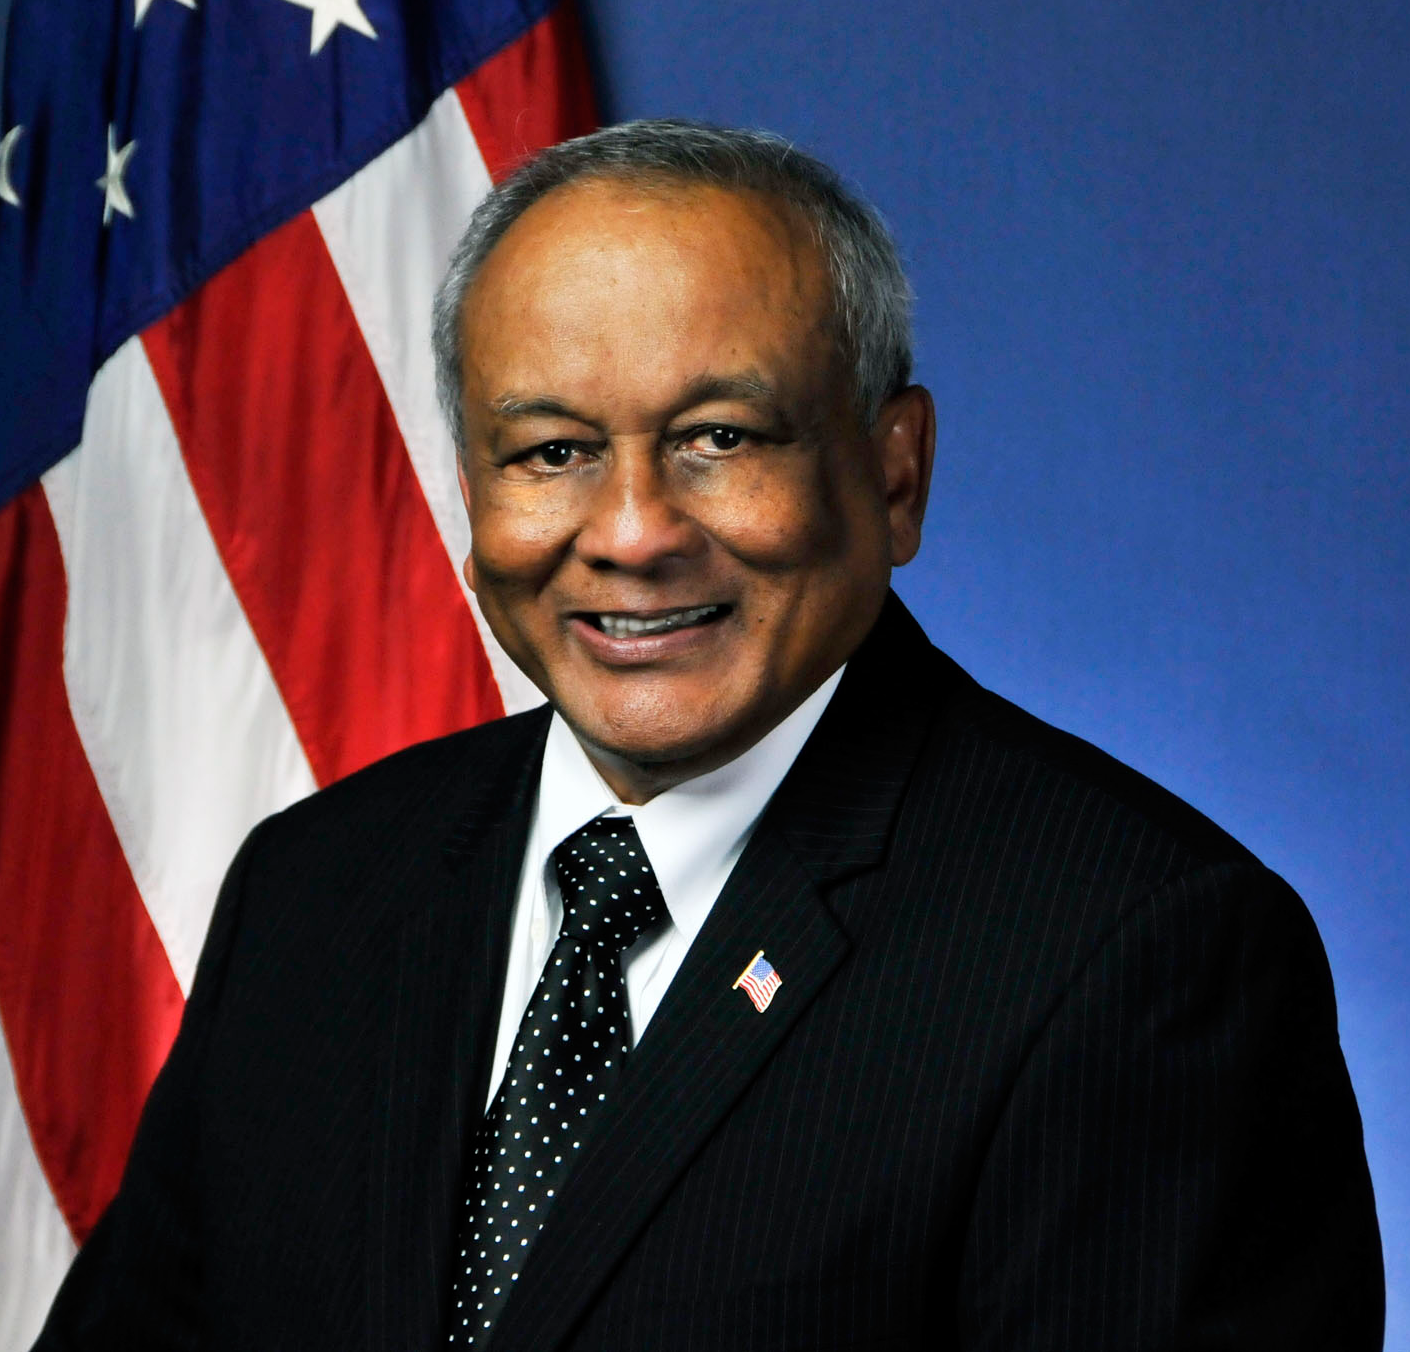 Mokhtee Ahmad: Regional Administrator for Region 7